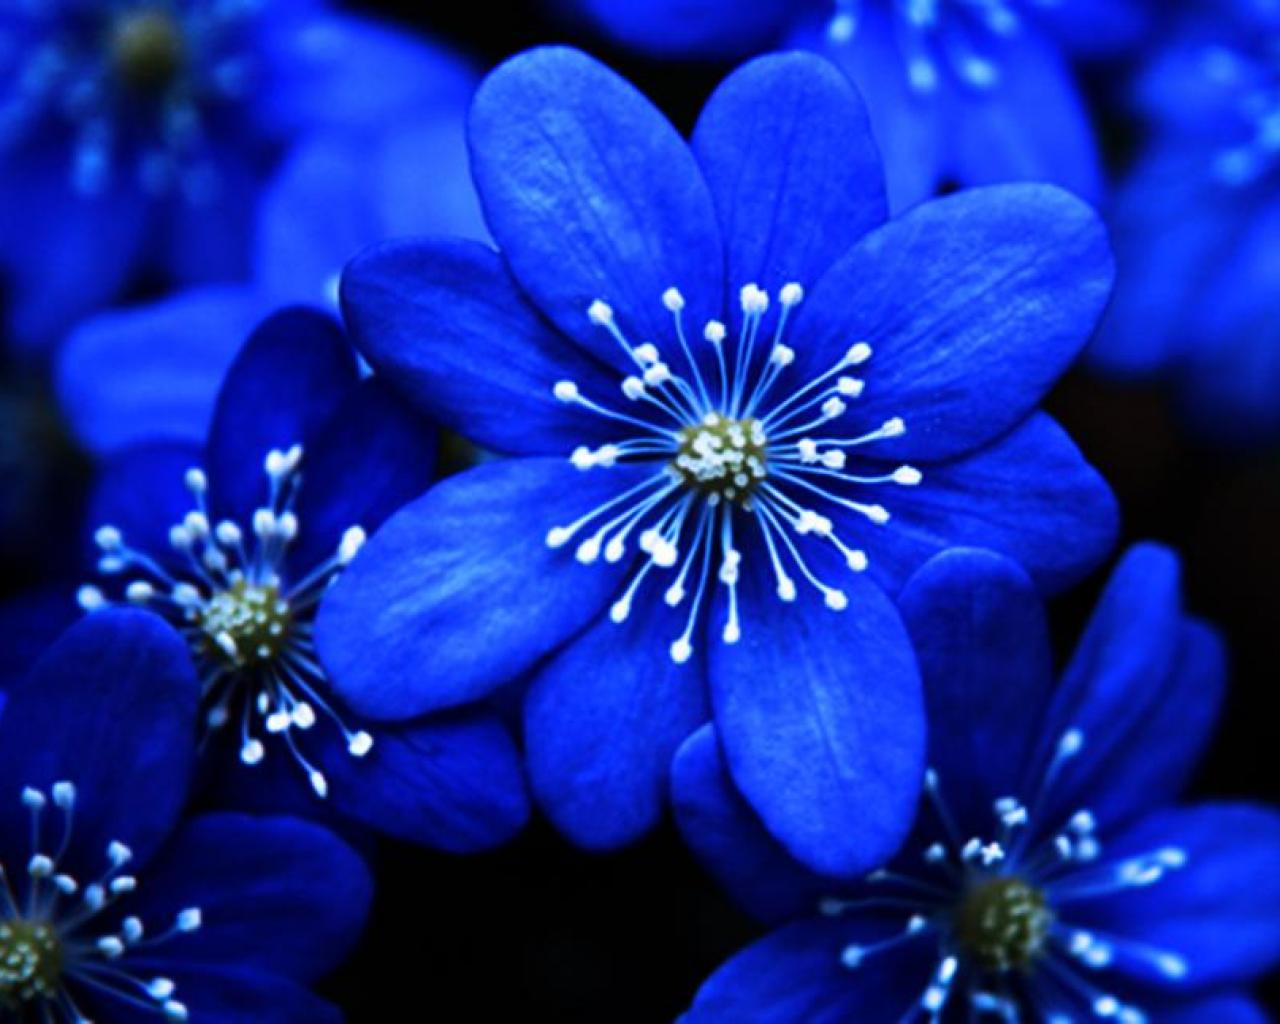 [47+] Blue Floral Wallpaper for Walls on WallpaperSafari